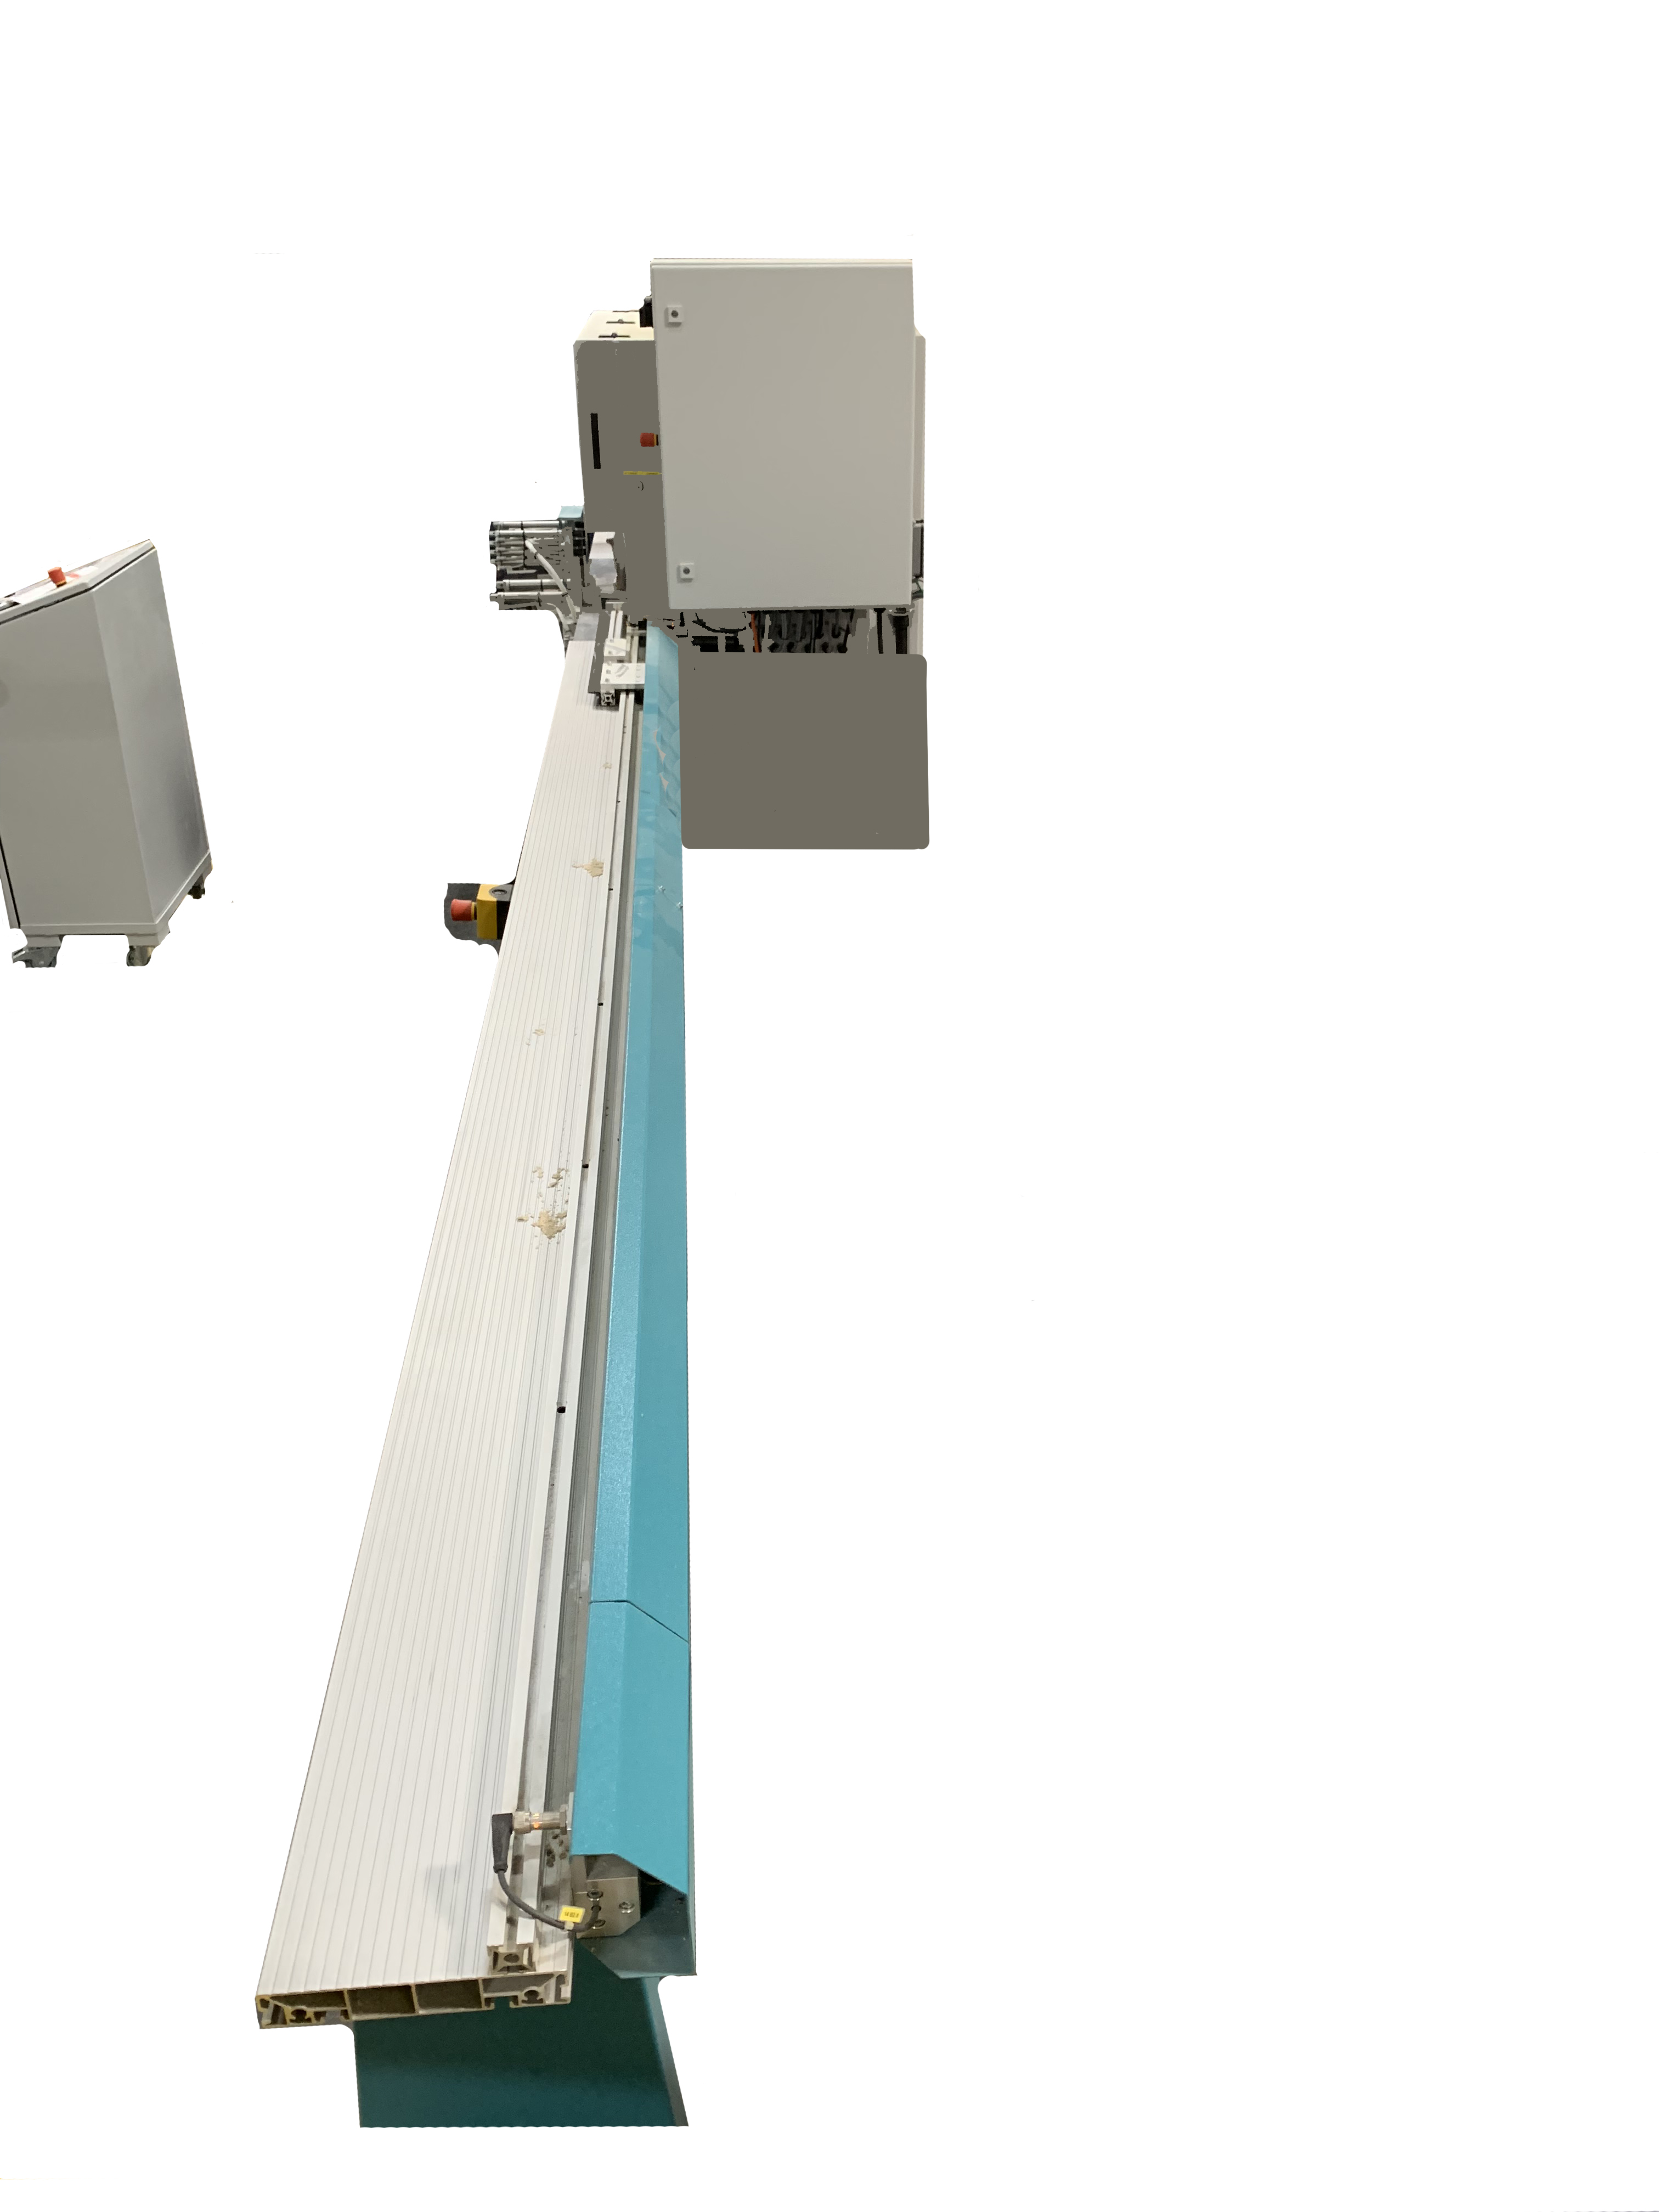 acs-1-length-positioning-system-sep.jpg